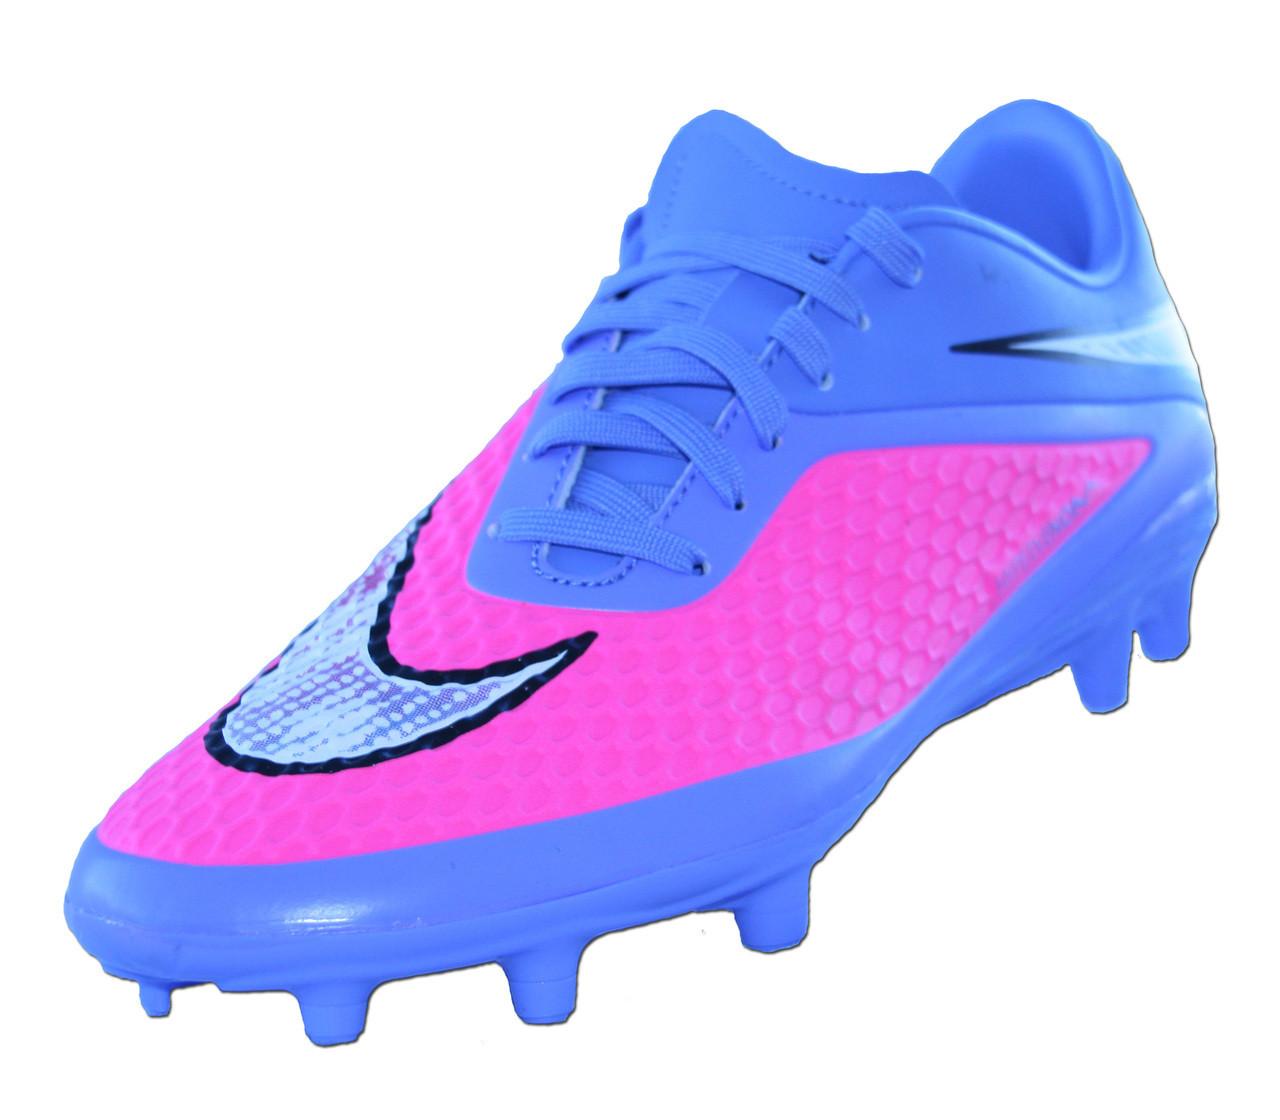 Nike Wmns Hypervenom Phelon - Purple